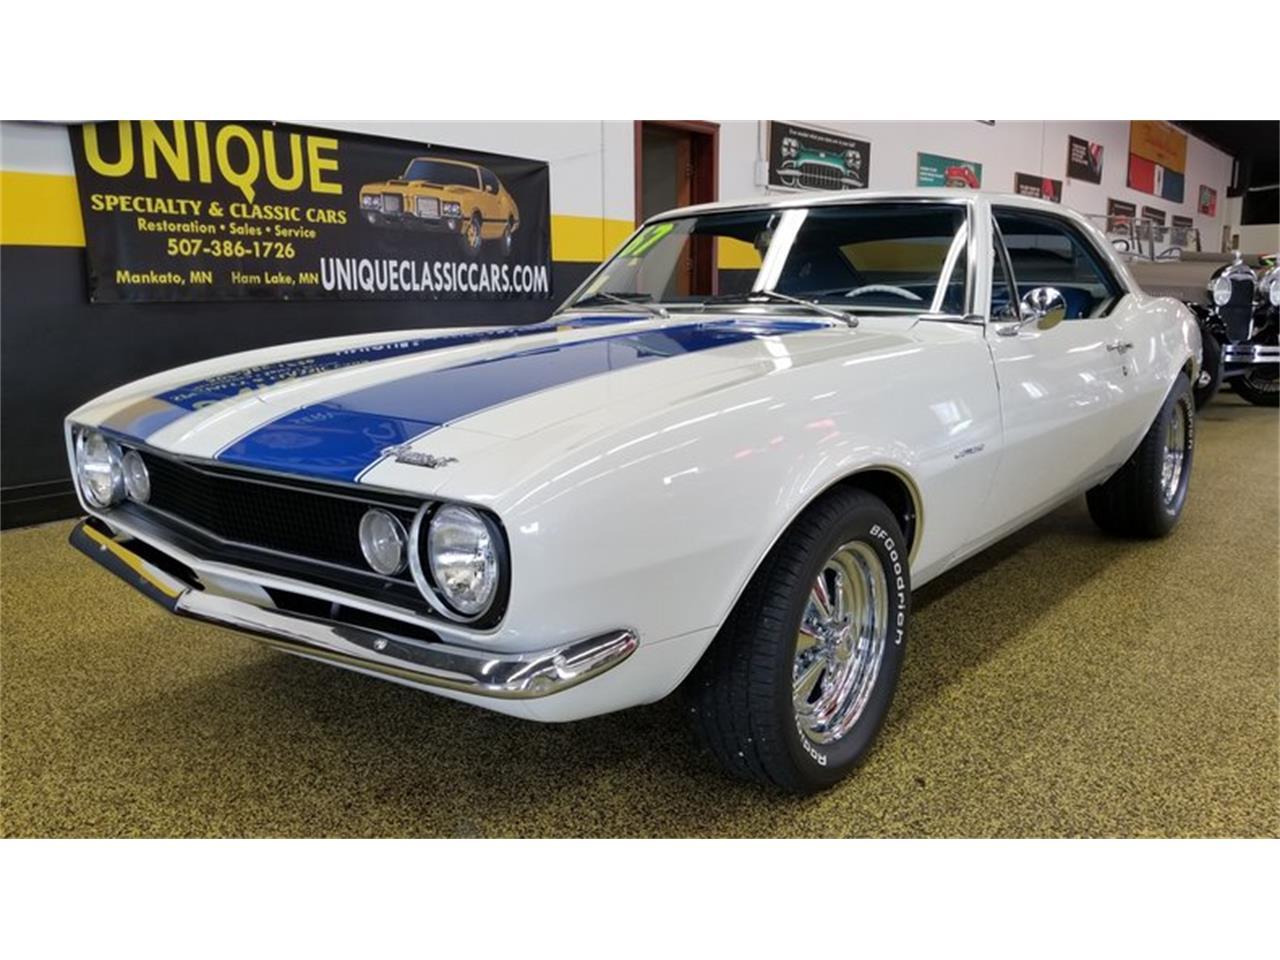 Classic Cars For Sale Mn >> 1967 Chevrolet Camaro For Sale In Mankato Mn